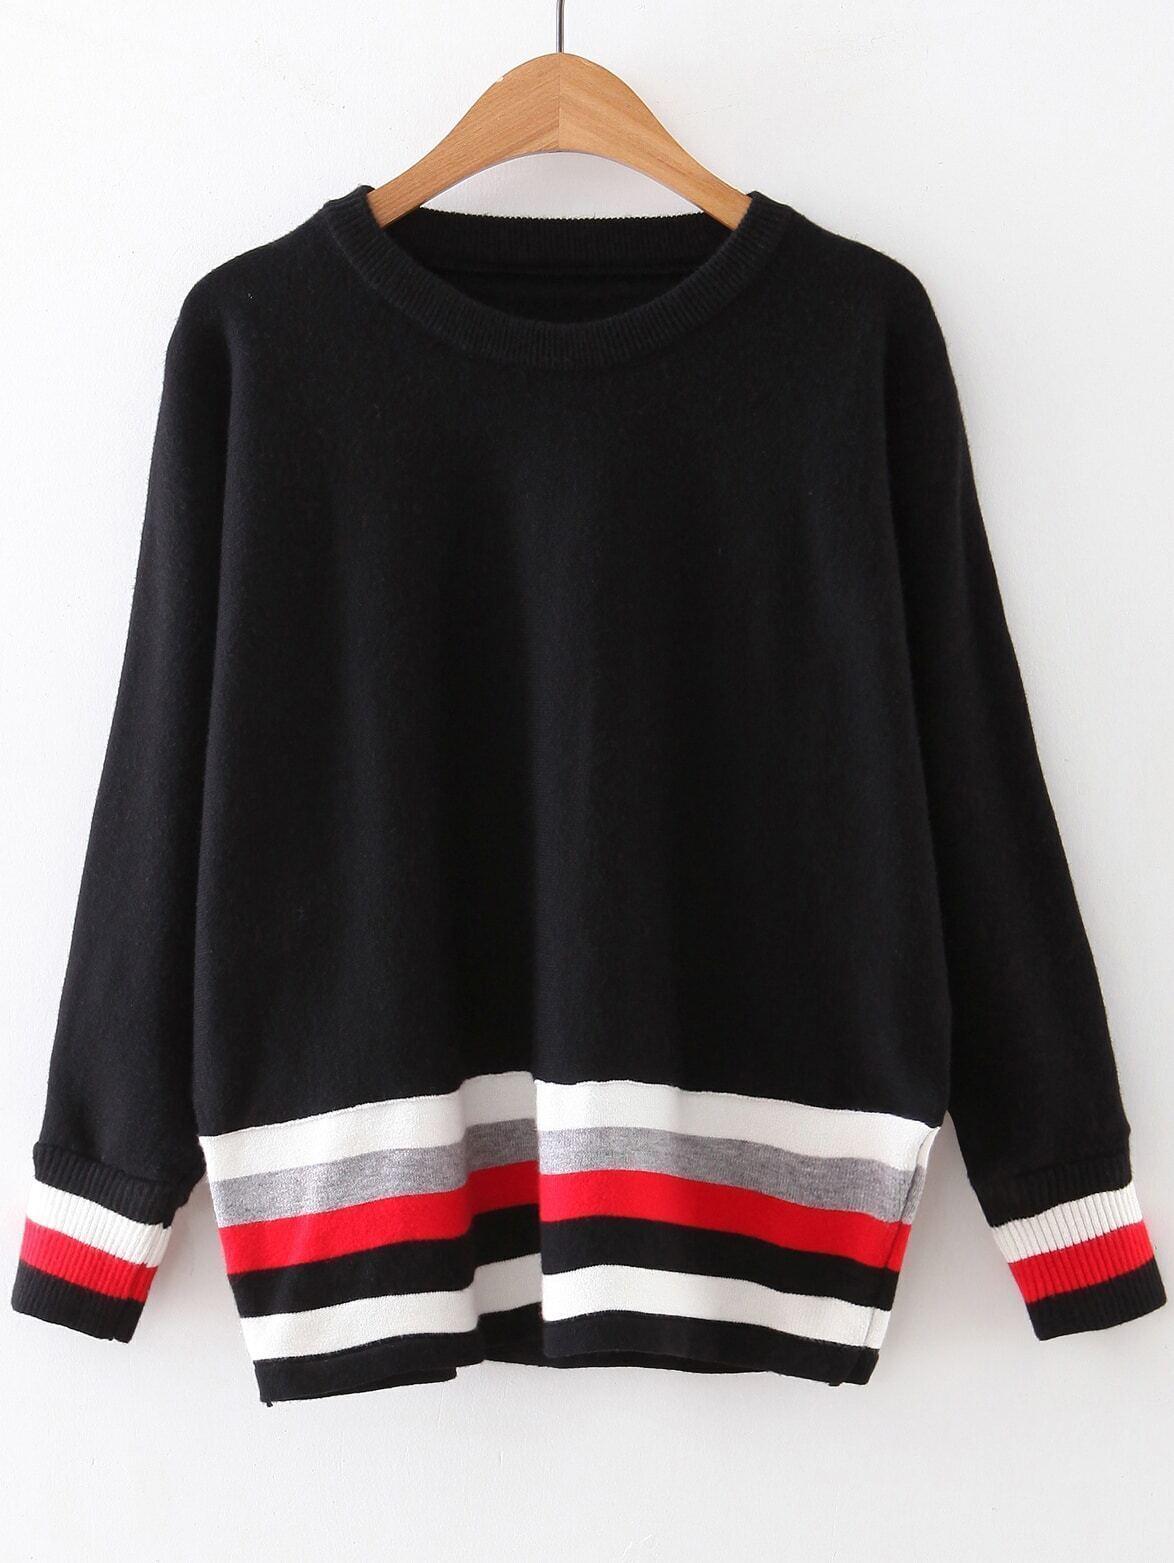 Black Color Block Ribbed Trim Knitwear sweater160923212